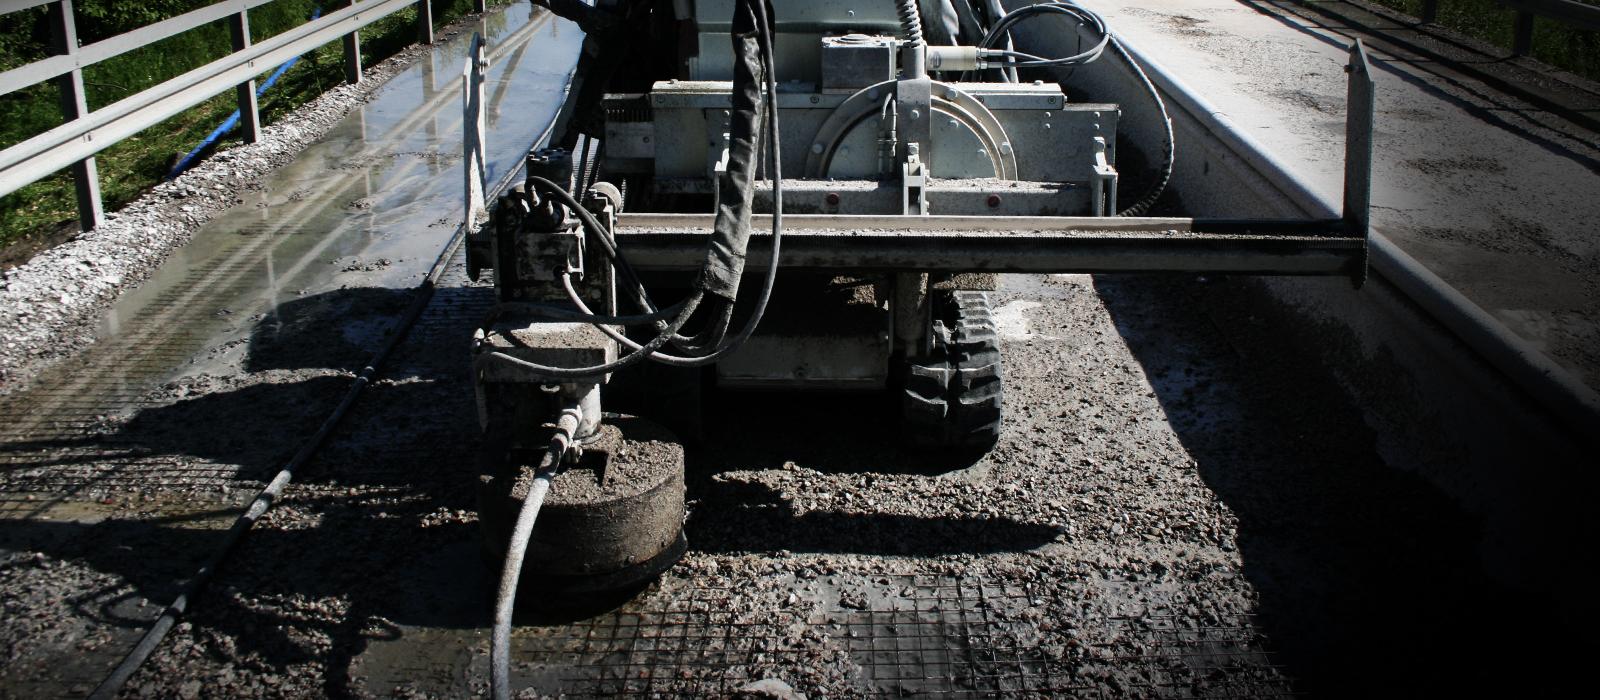 Rotolance Hydrodemolition Accessory